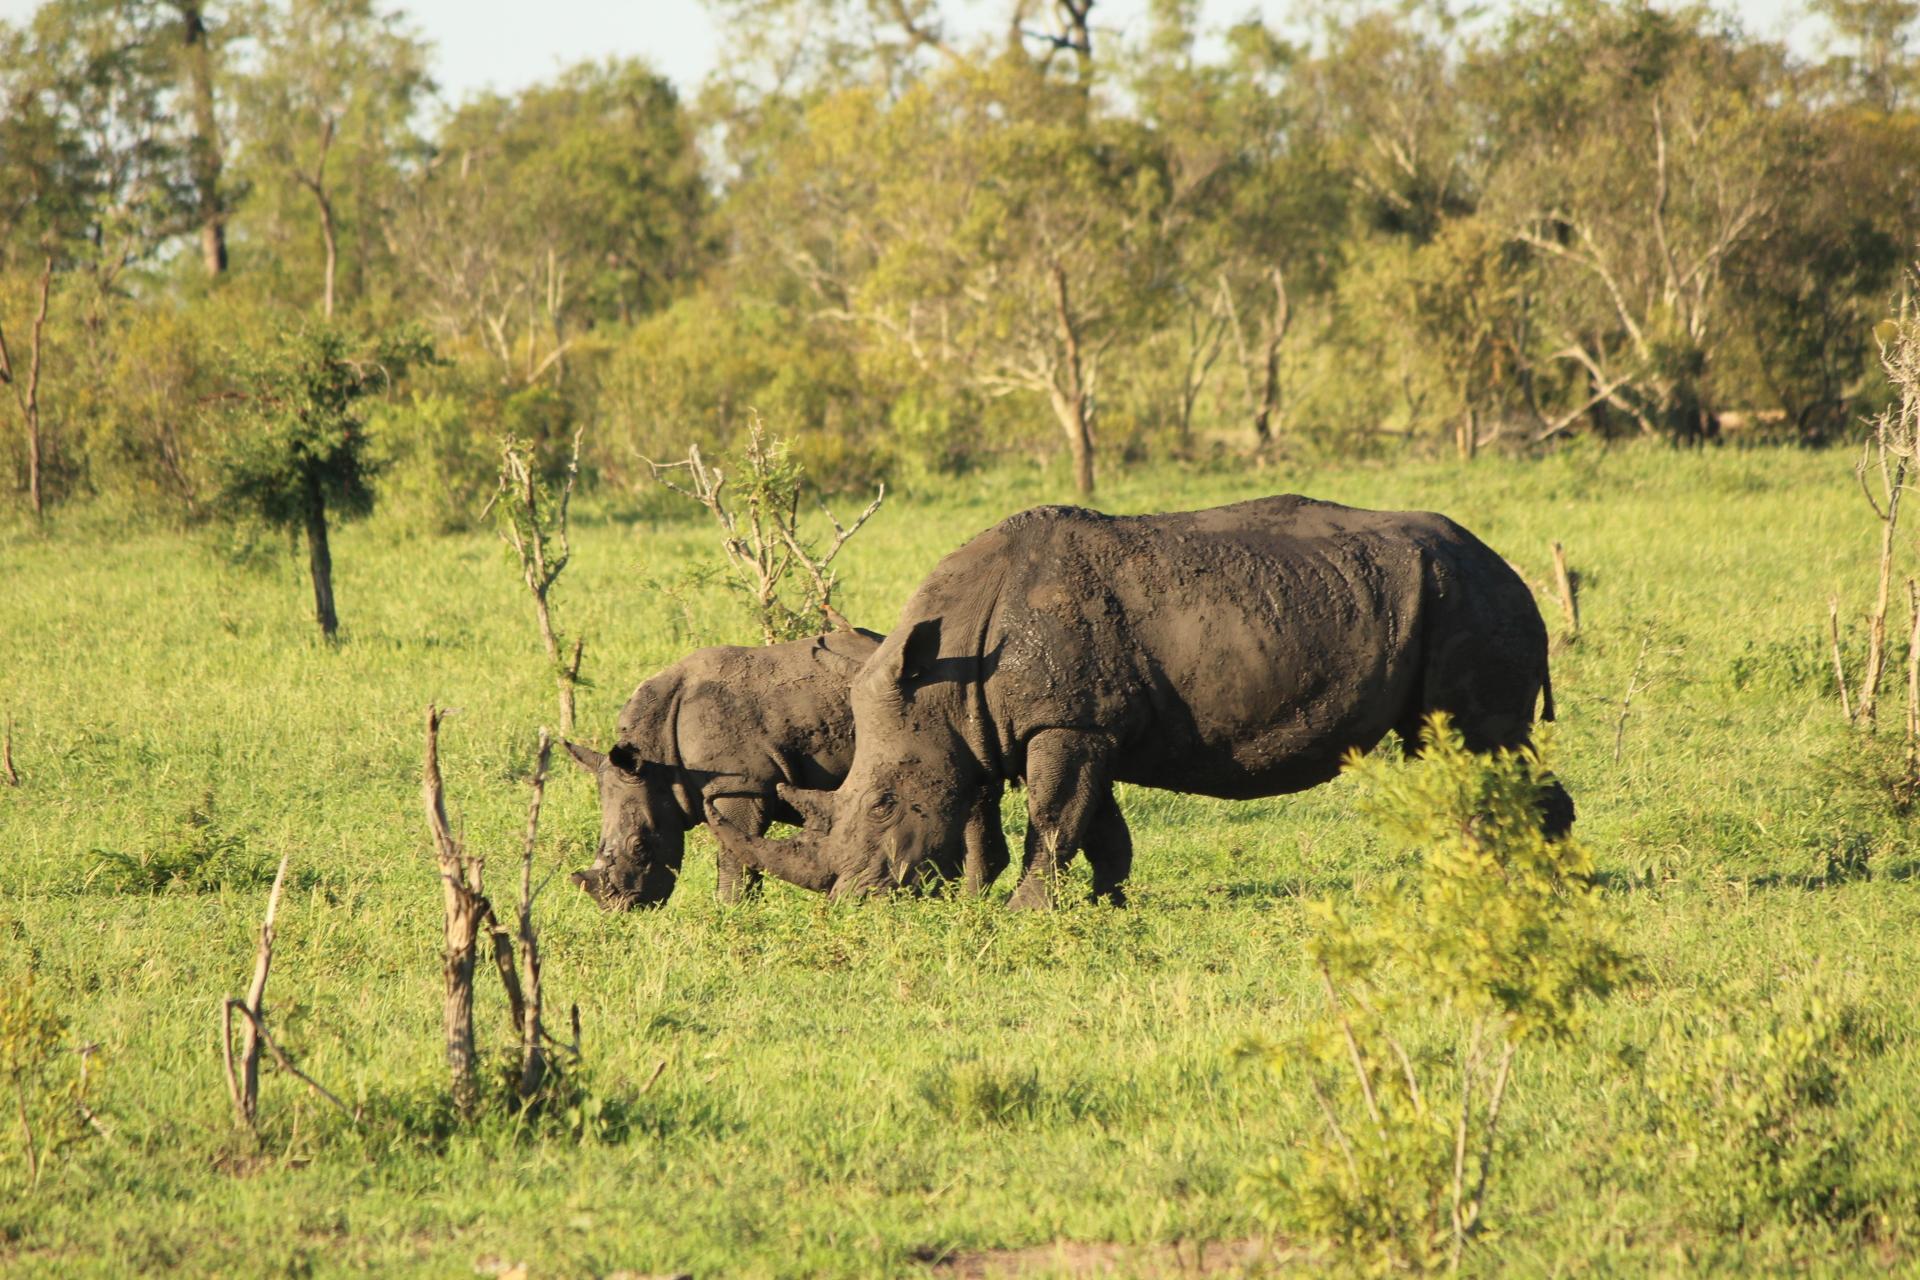 2018 South Africa Trip, Part 19: Kruger National Park, Day 1